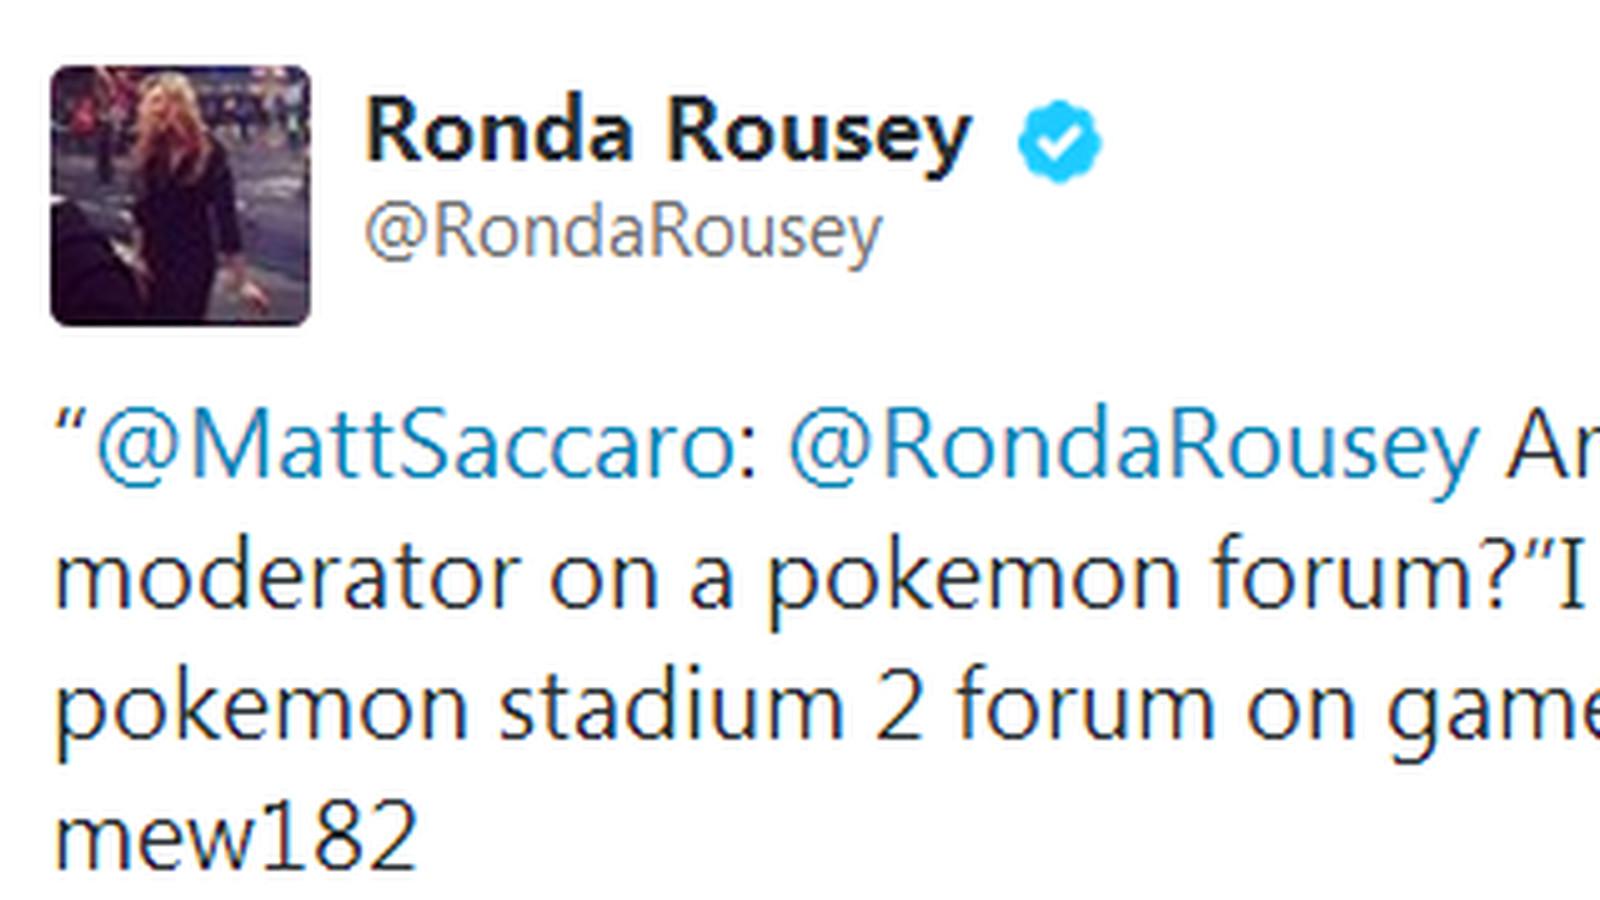 Ronda Rousey作为神奇宝贝论坛版主的形象非常棒